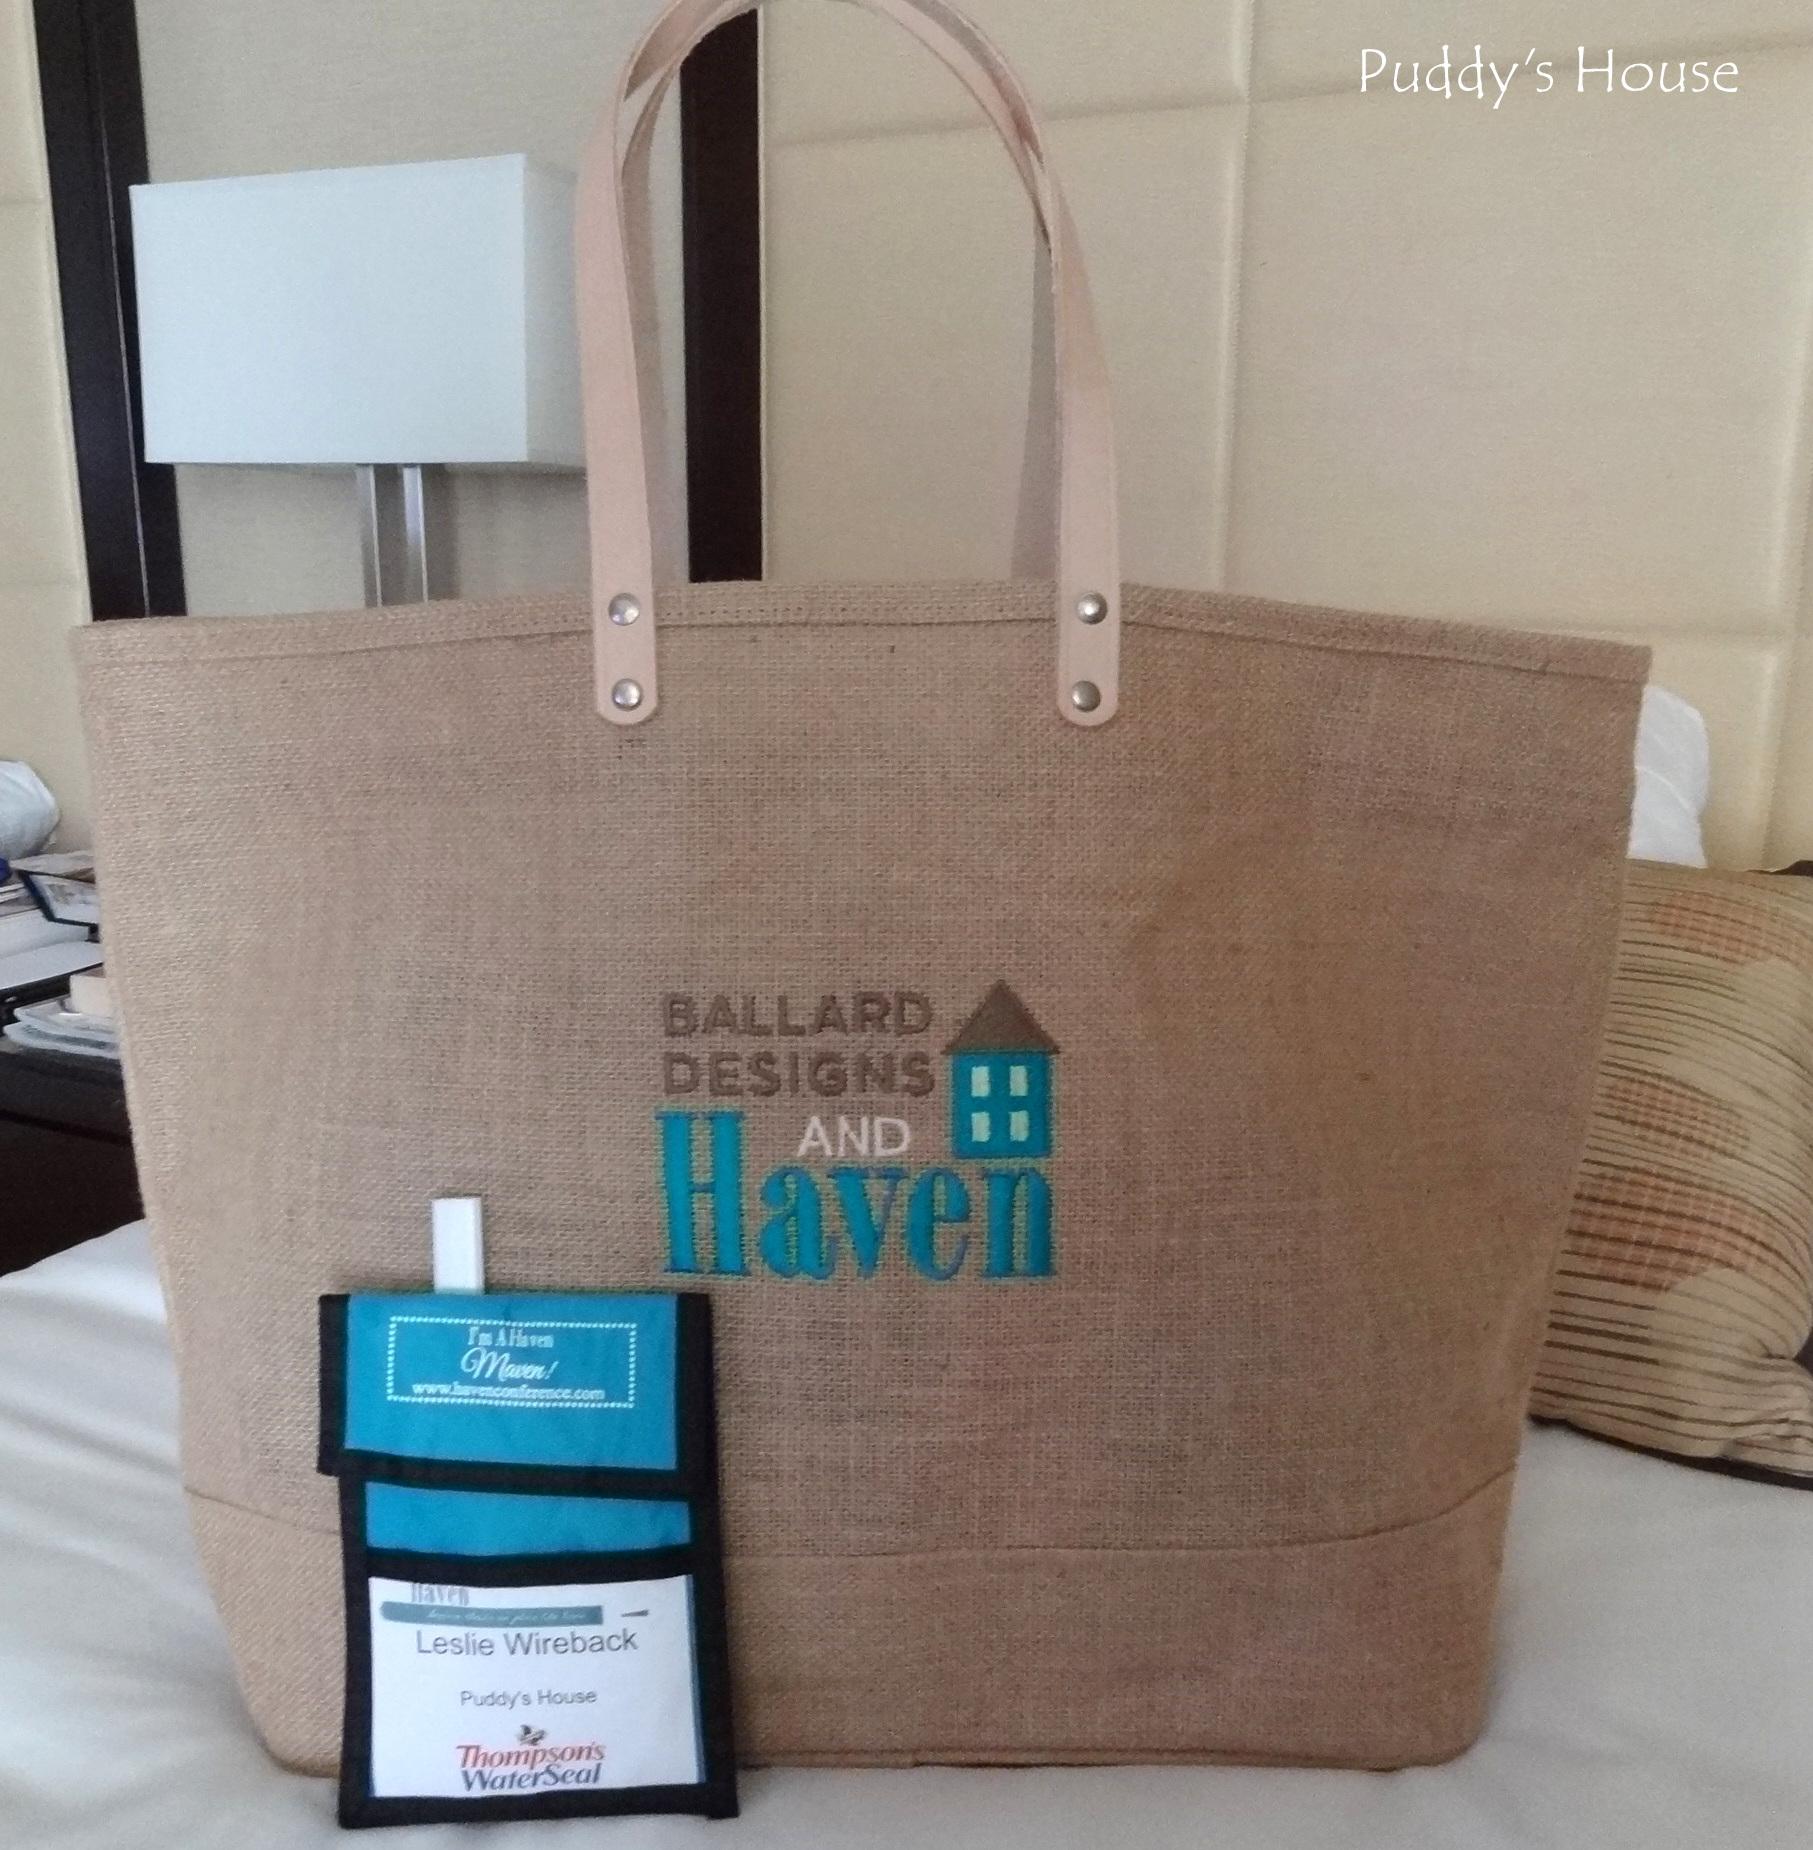 Haven 2013 - Swag Bag and Name Tag